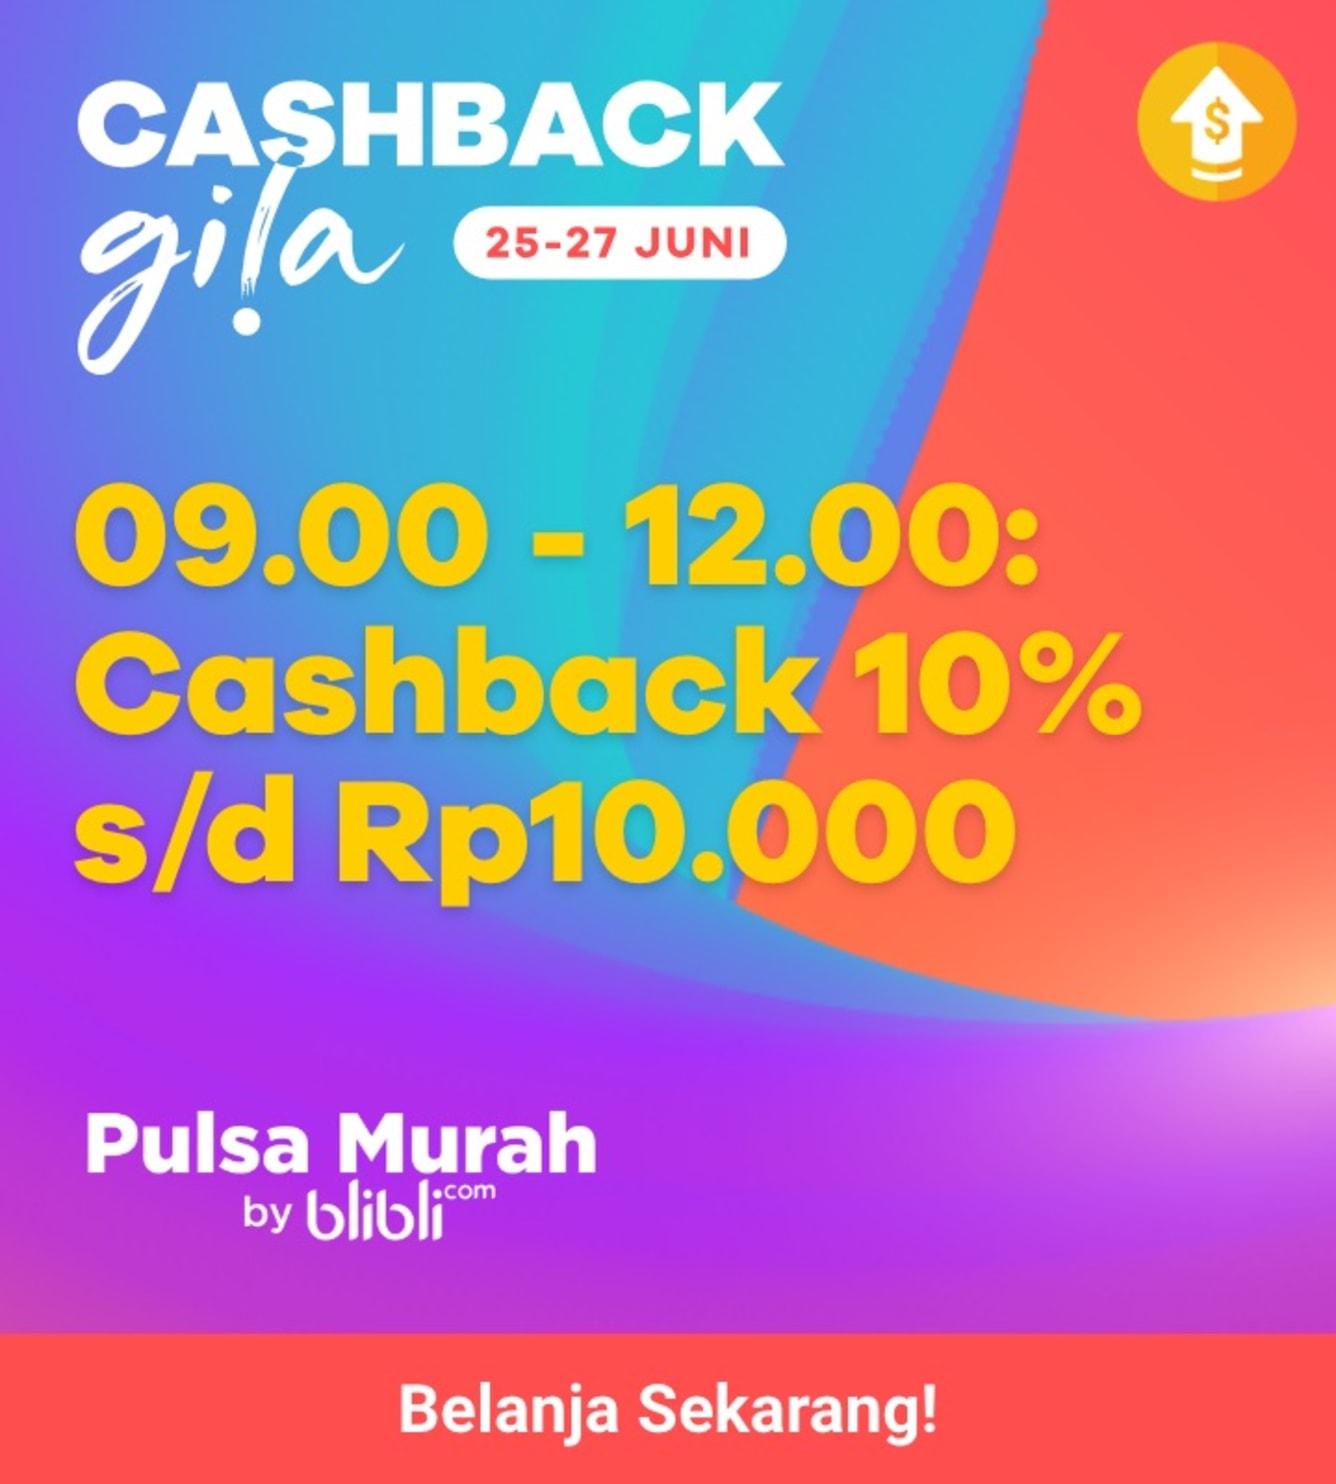 Week 26 - Cashback Gila Pulsa Blibli